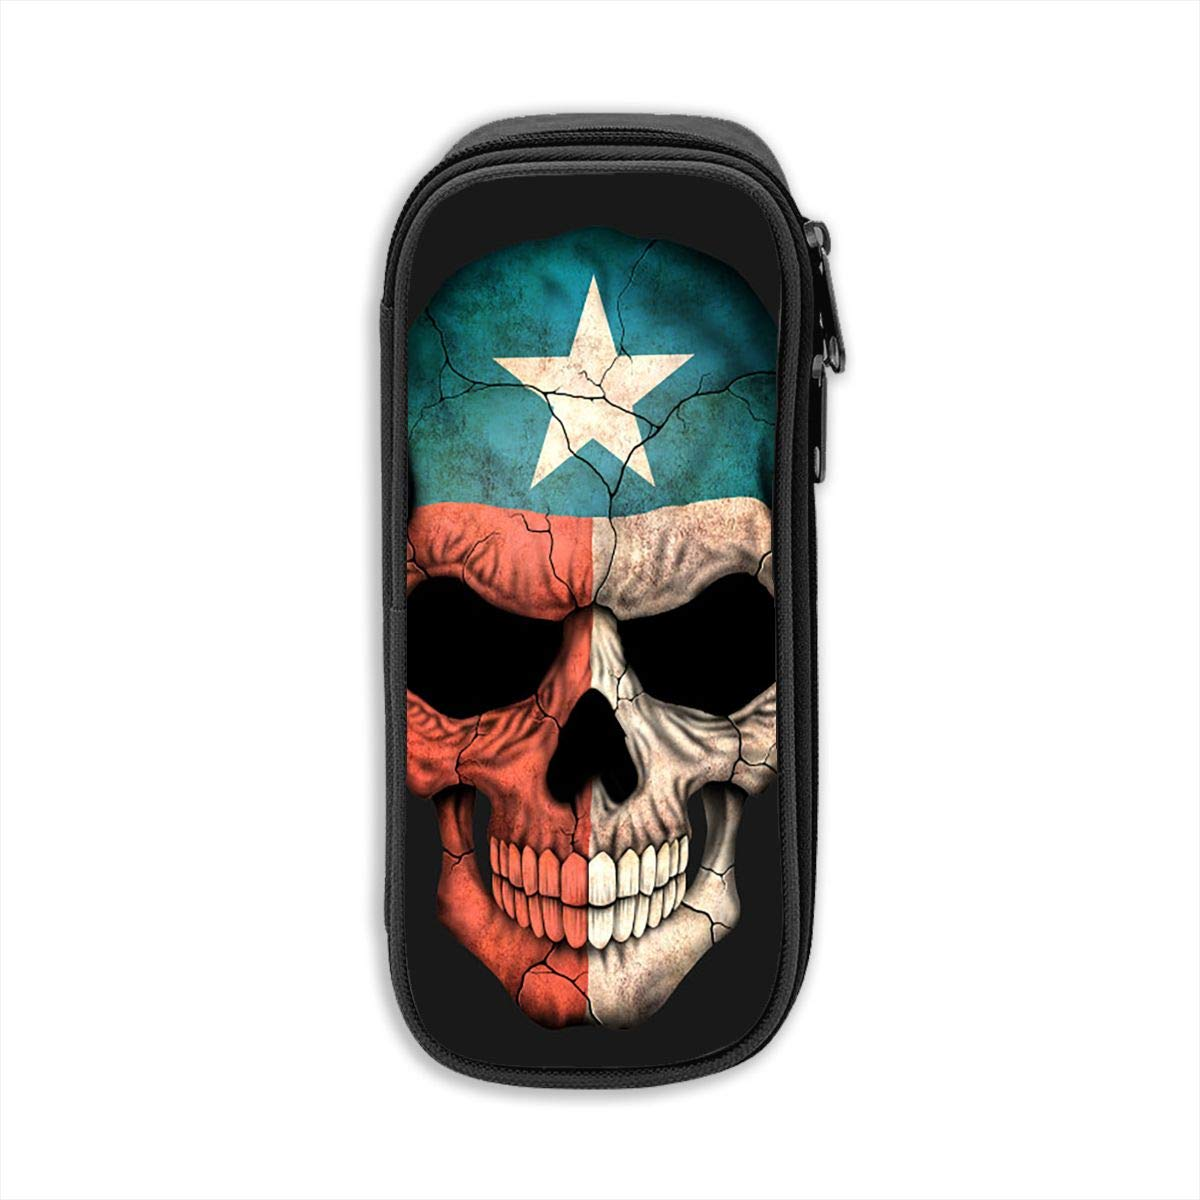 WJHONi WJHONi WJHONi Horizon-t Bandera mexicana Hombres Multifuncional Lona Pen Bolsa Estuche Maquillaje Bolsa de herramientas Bolsa de almacenamiento Bolsa 7fc07d